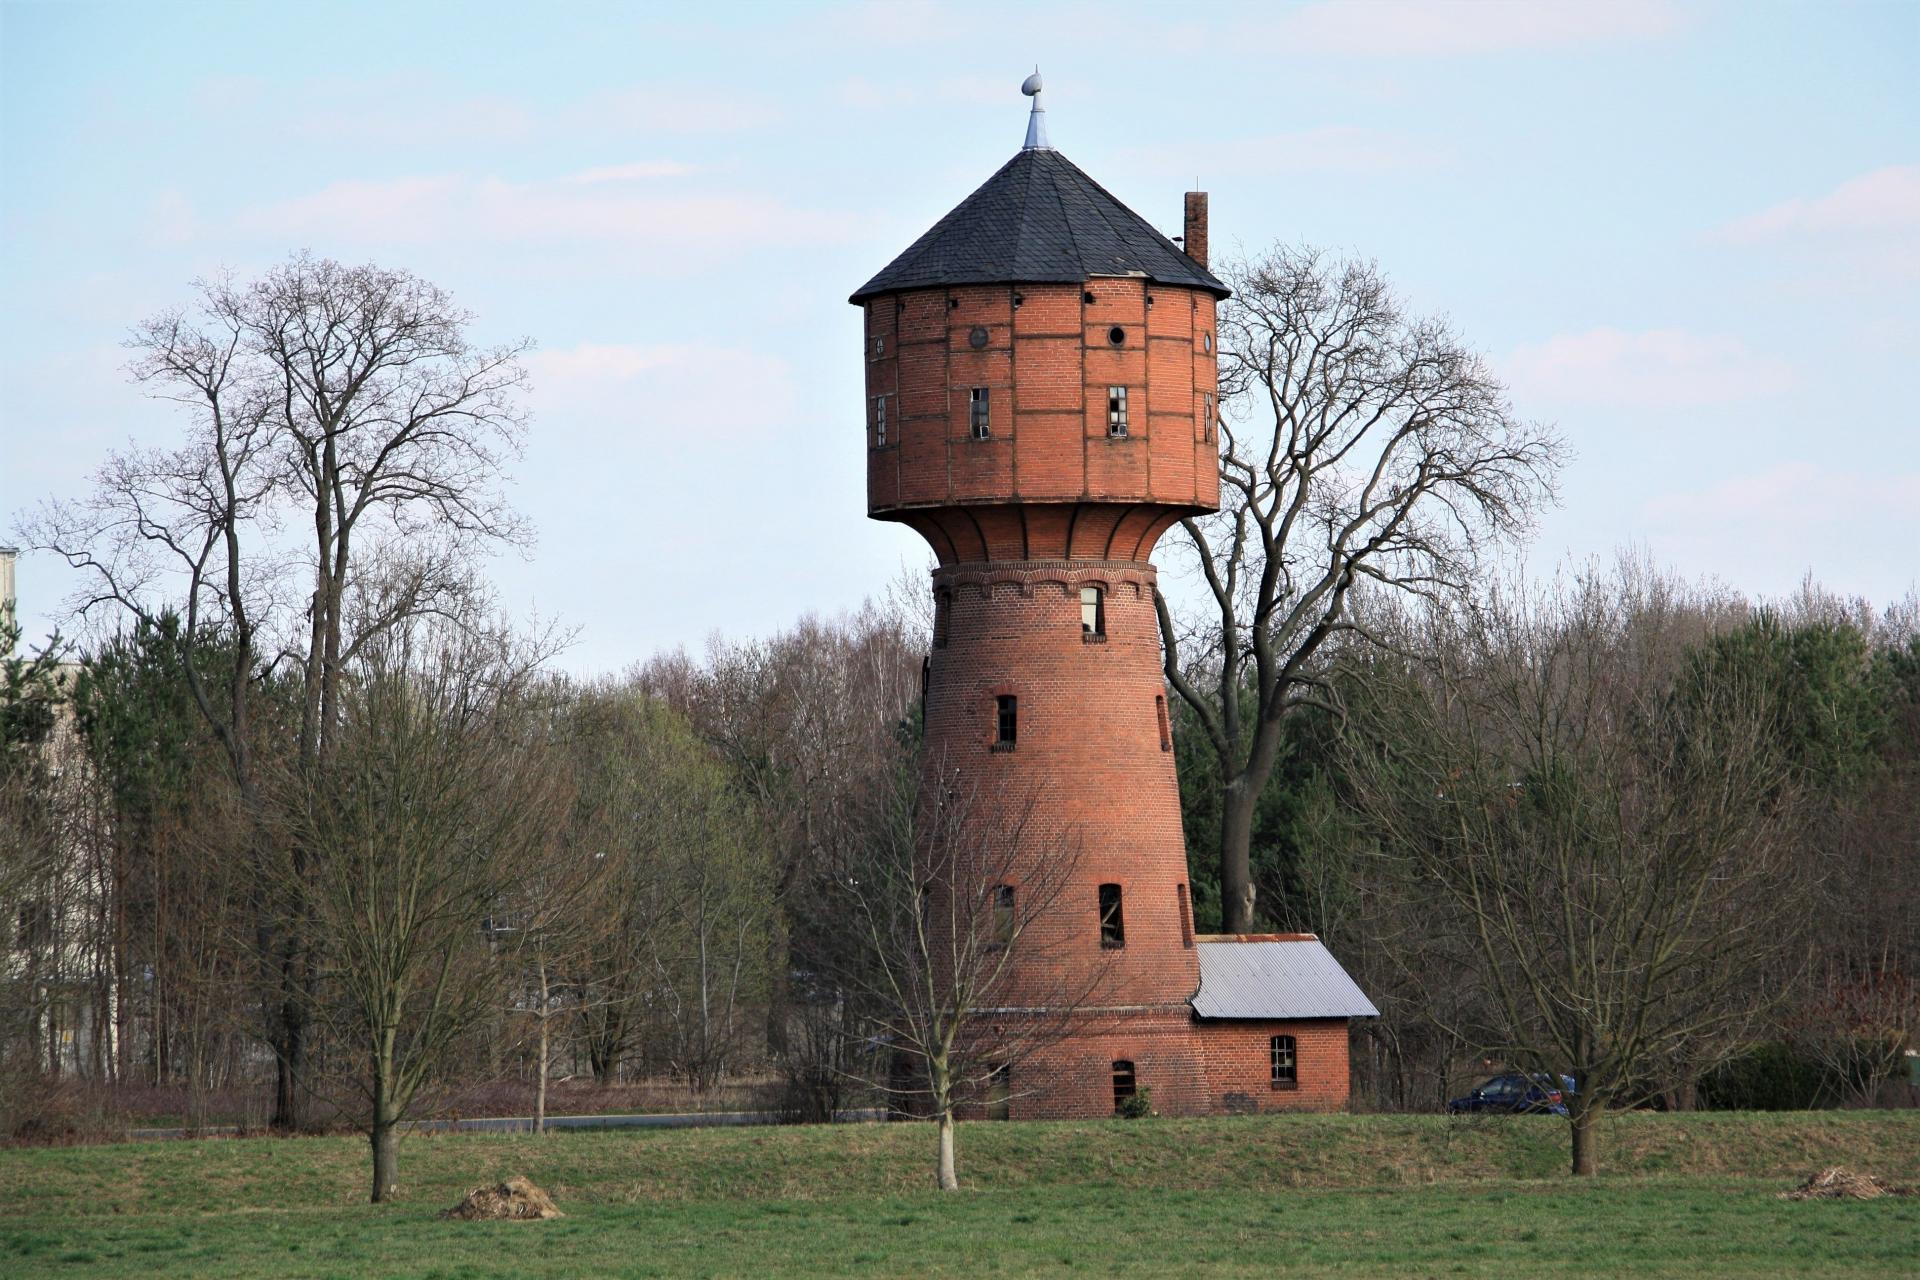 Wasserturm Uhsmannsdorf © Boris Umerkaev